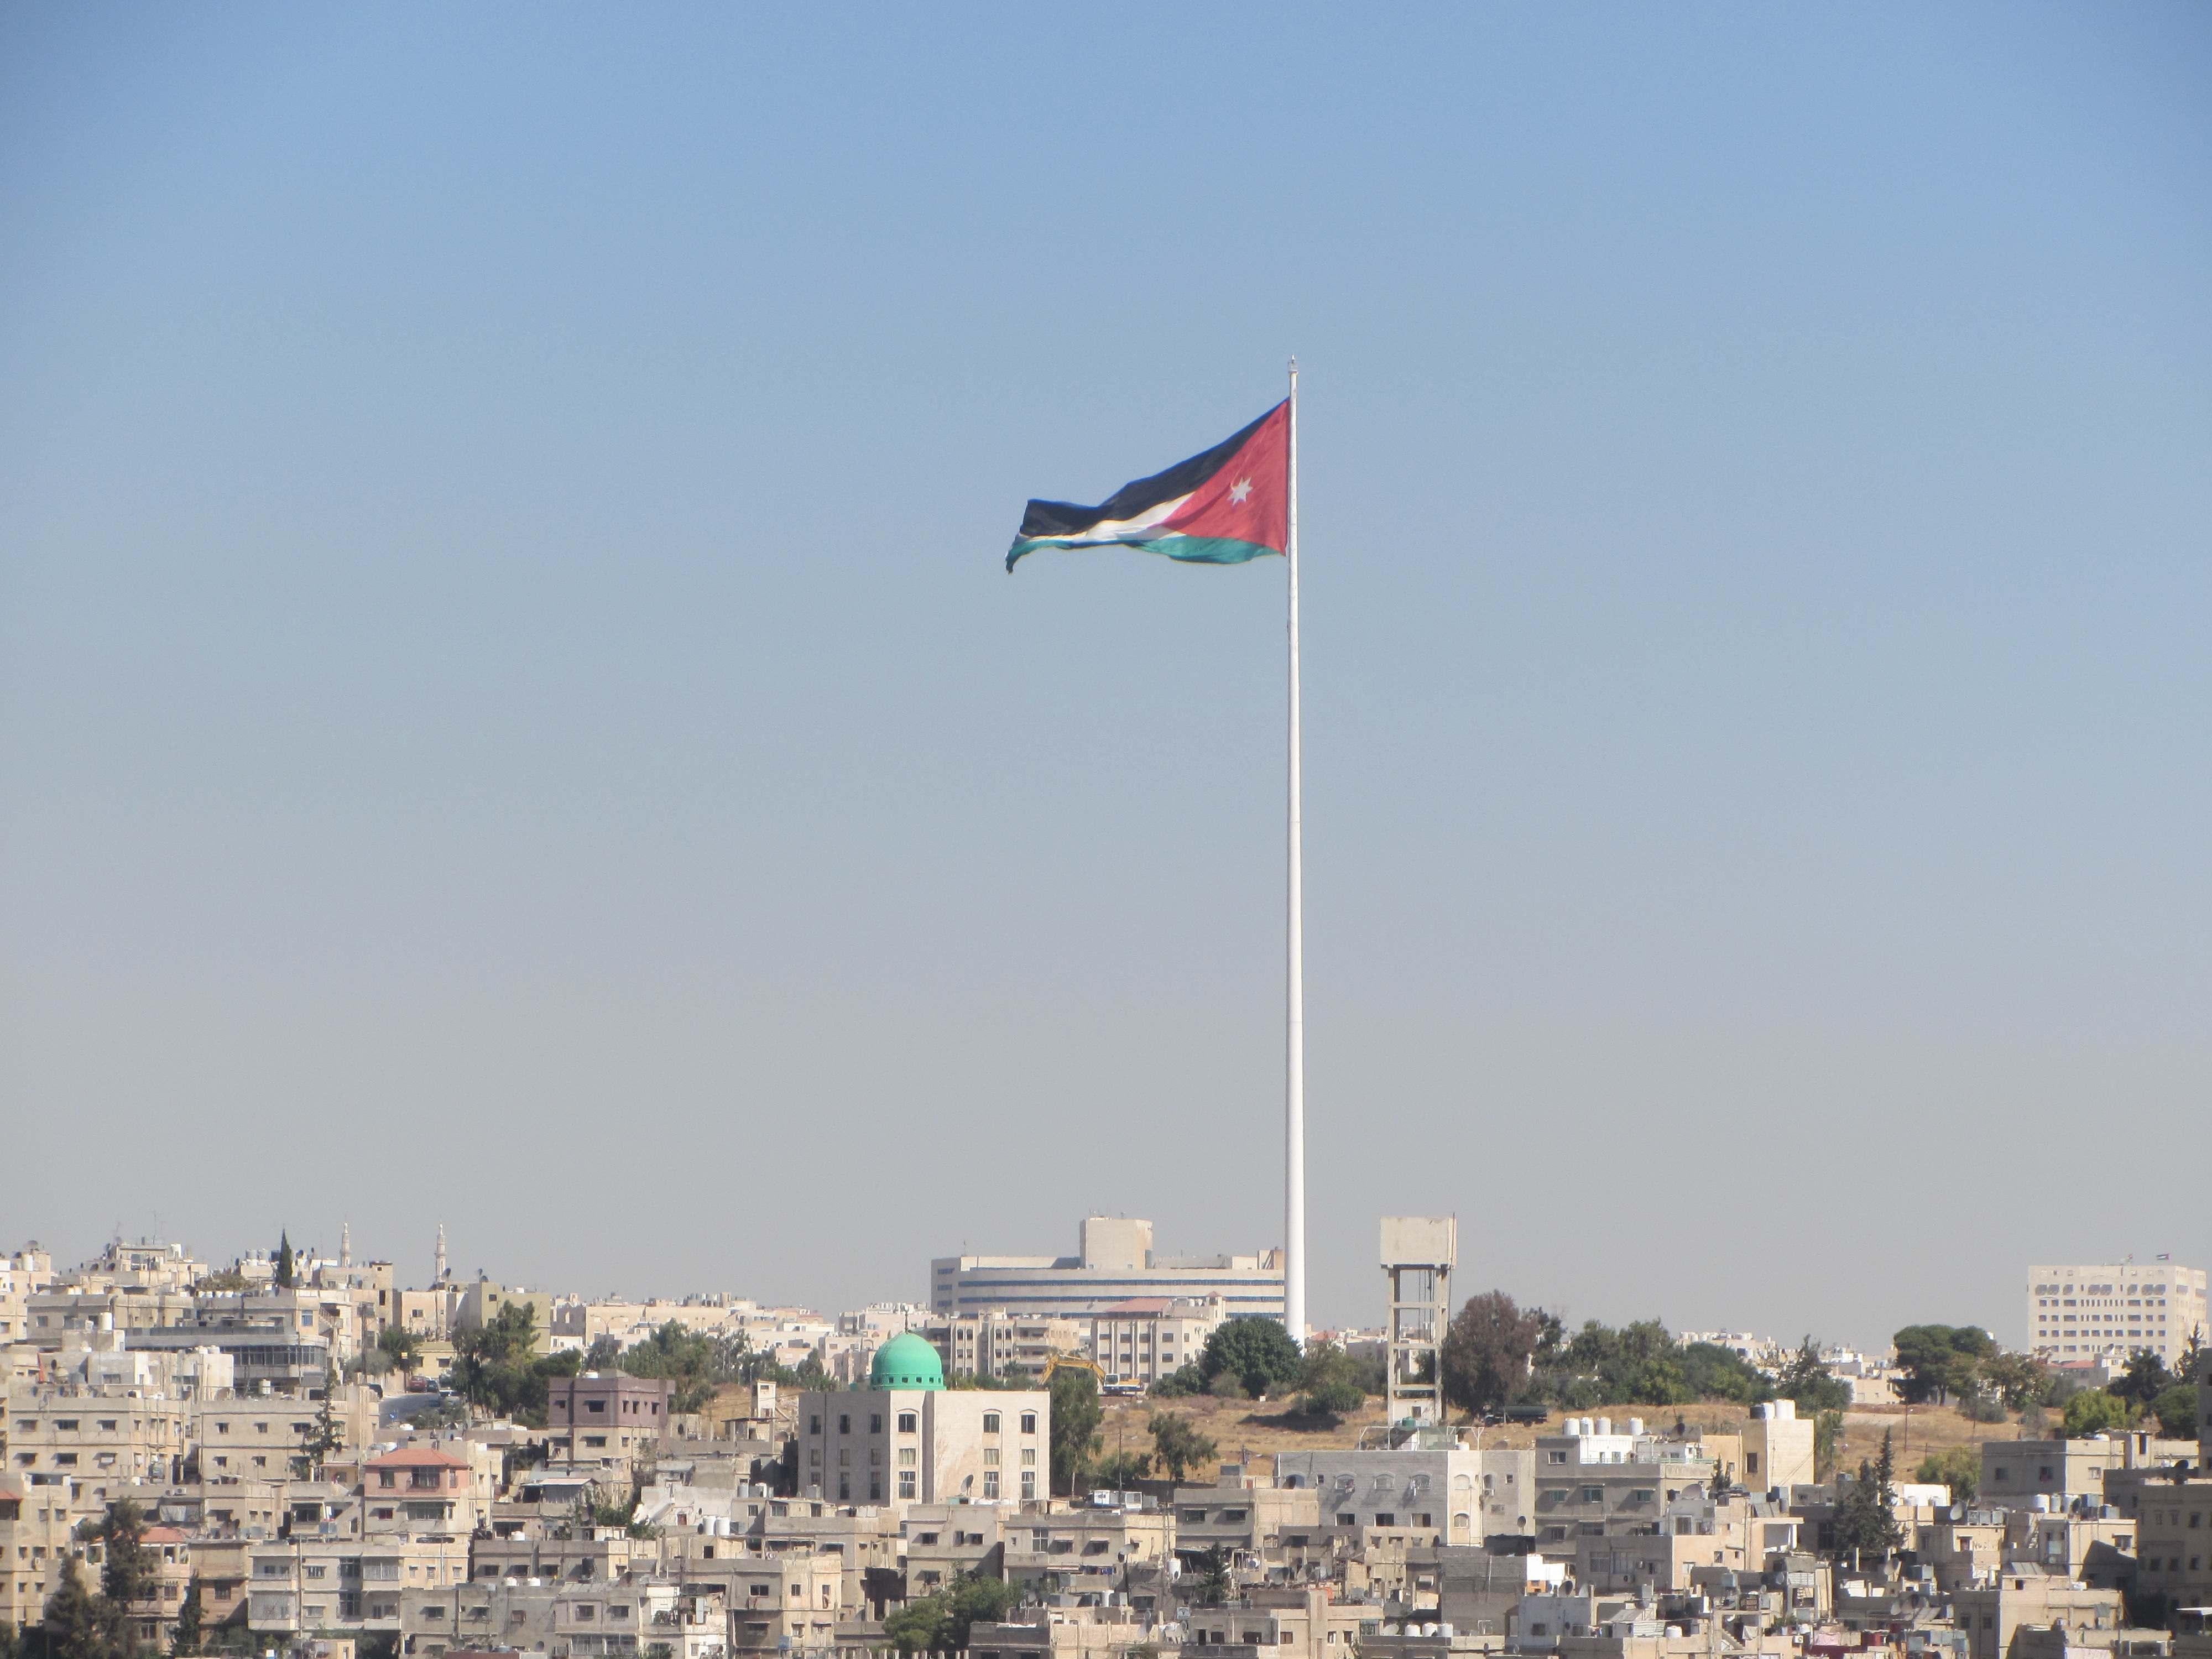 Ahlan wa Sahlan in Jordanien